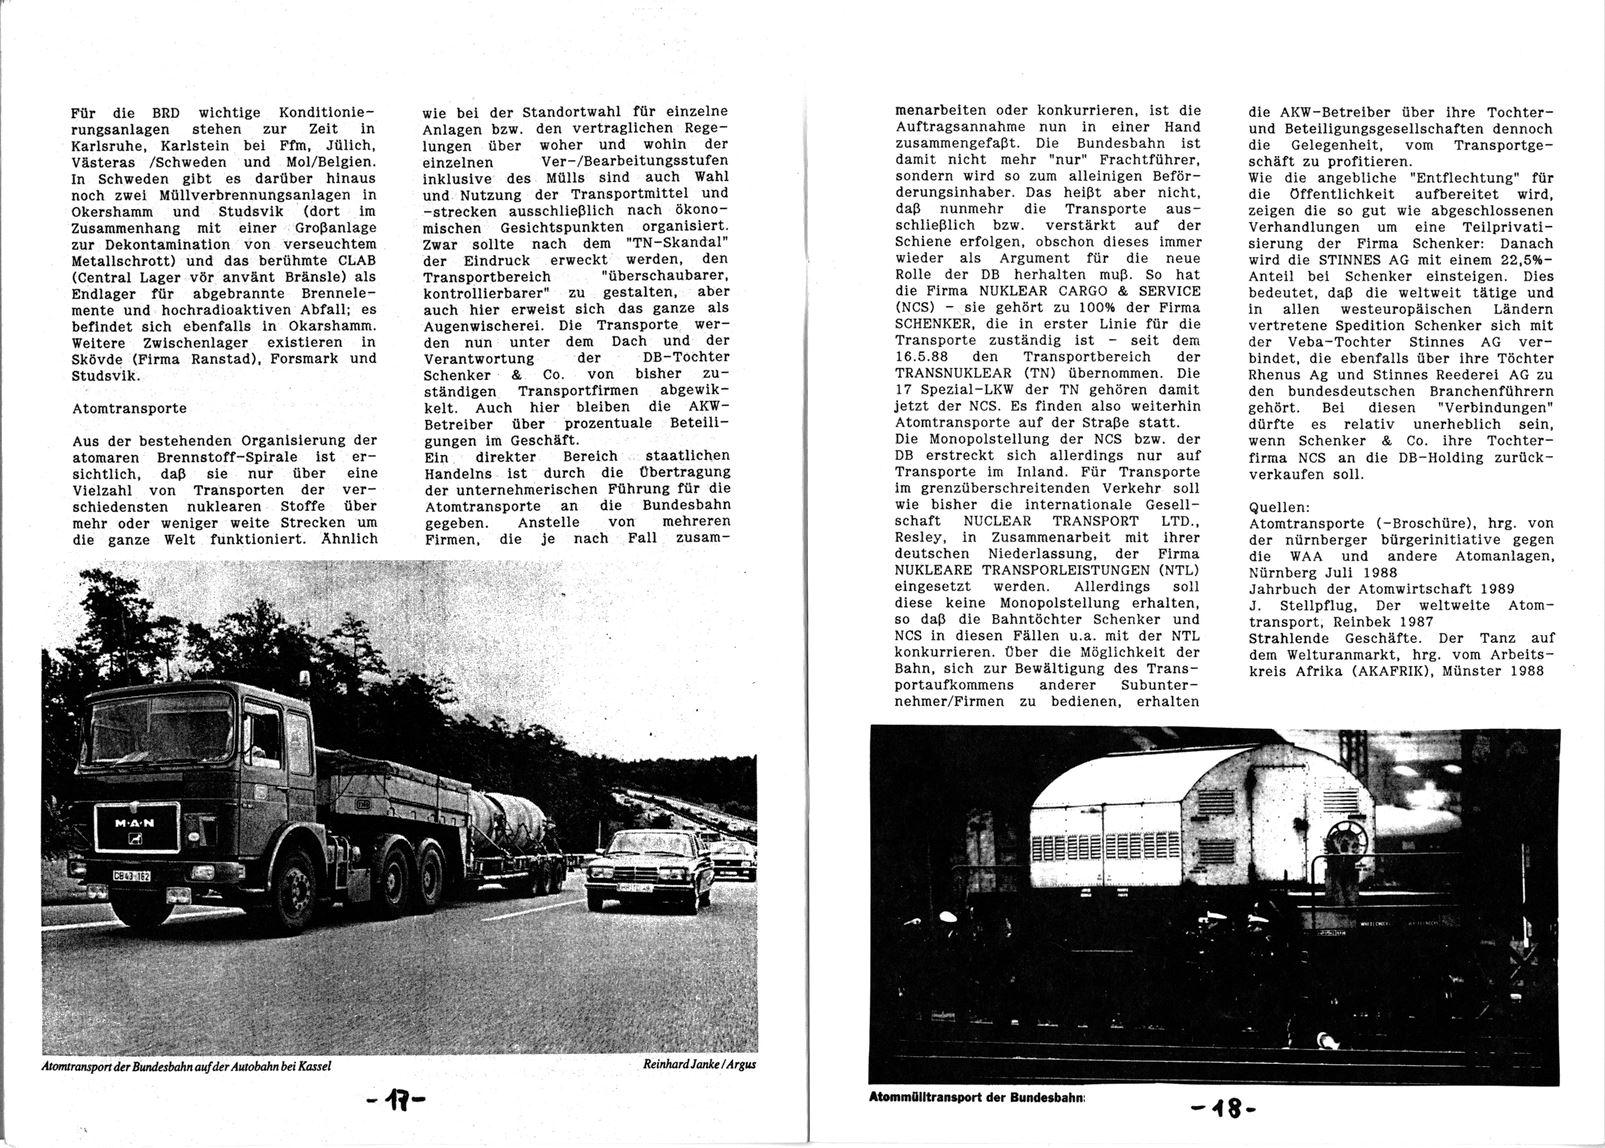 Hamburg_Atomtransporte_19900200_010